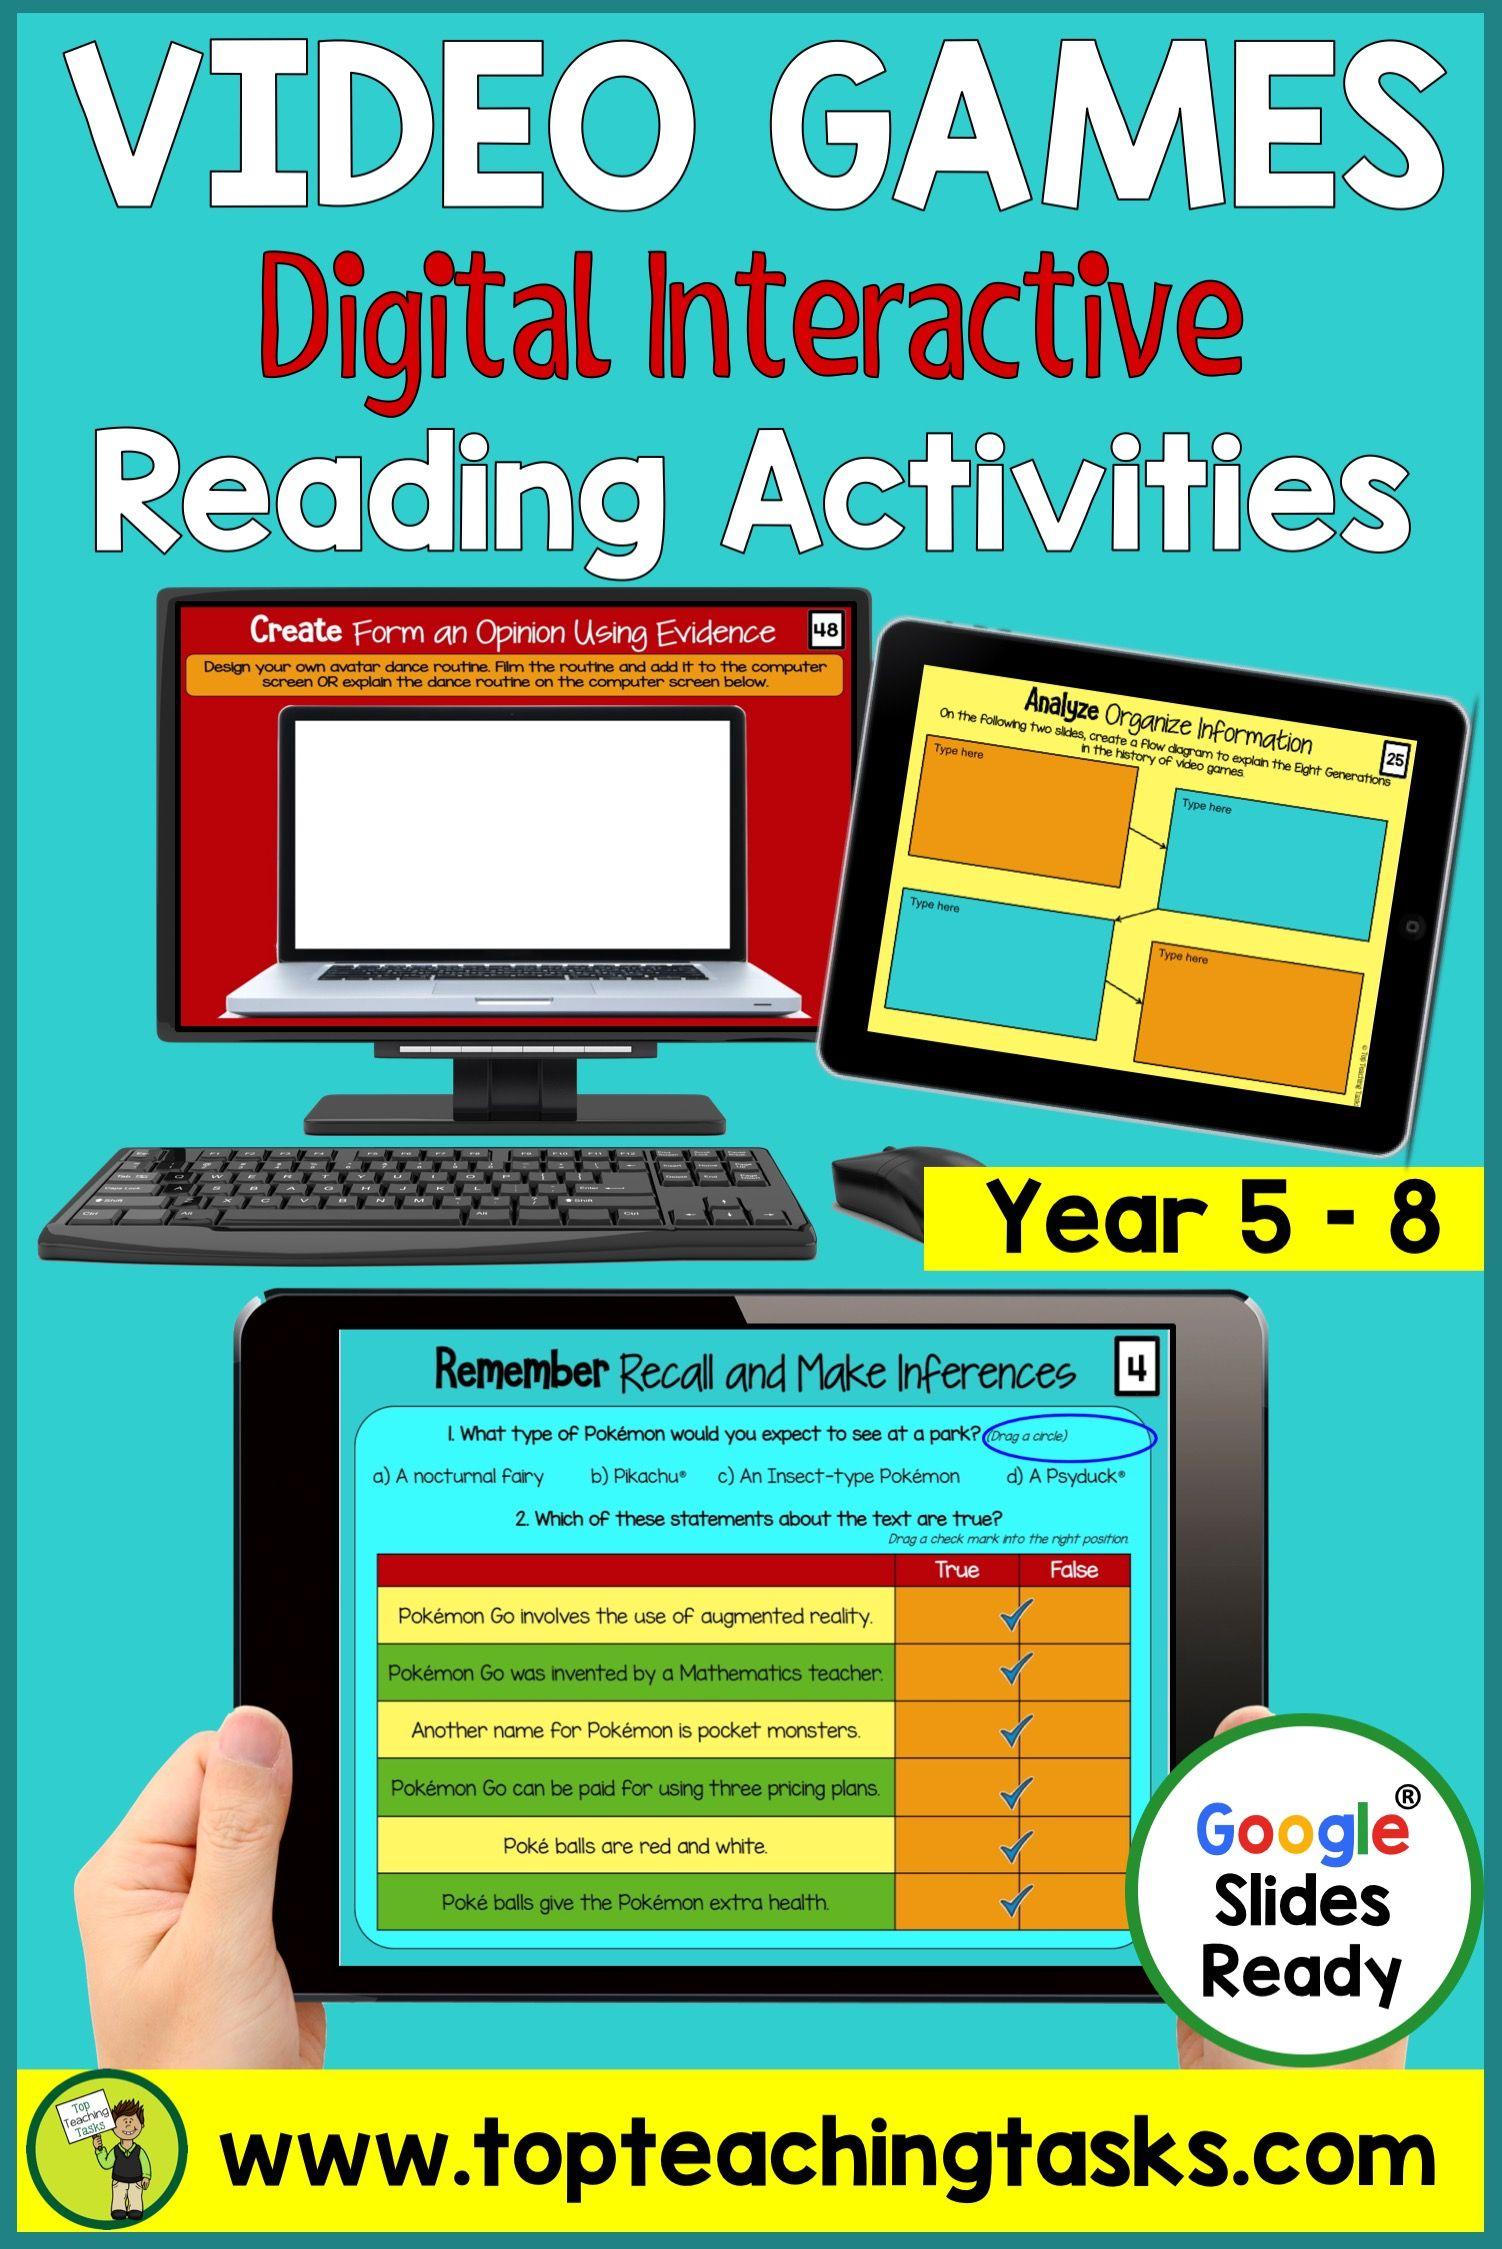 Video Games Digital Reading Activities Reading Comprehension Activities Reading Comprehension Comprehension Activities Guided reading lesson grade video